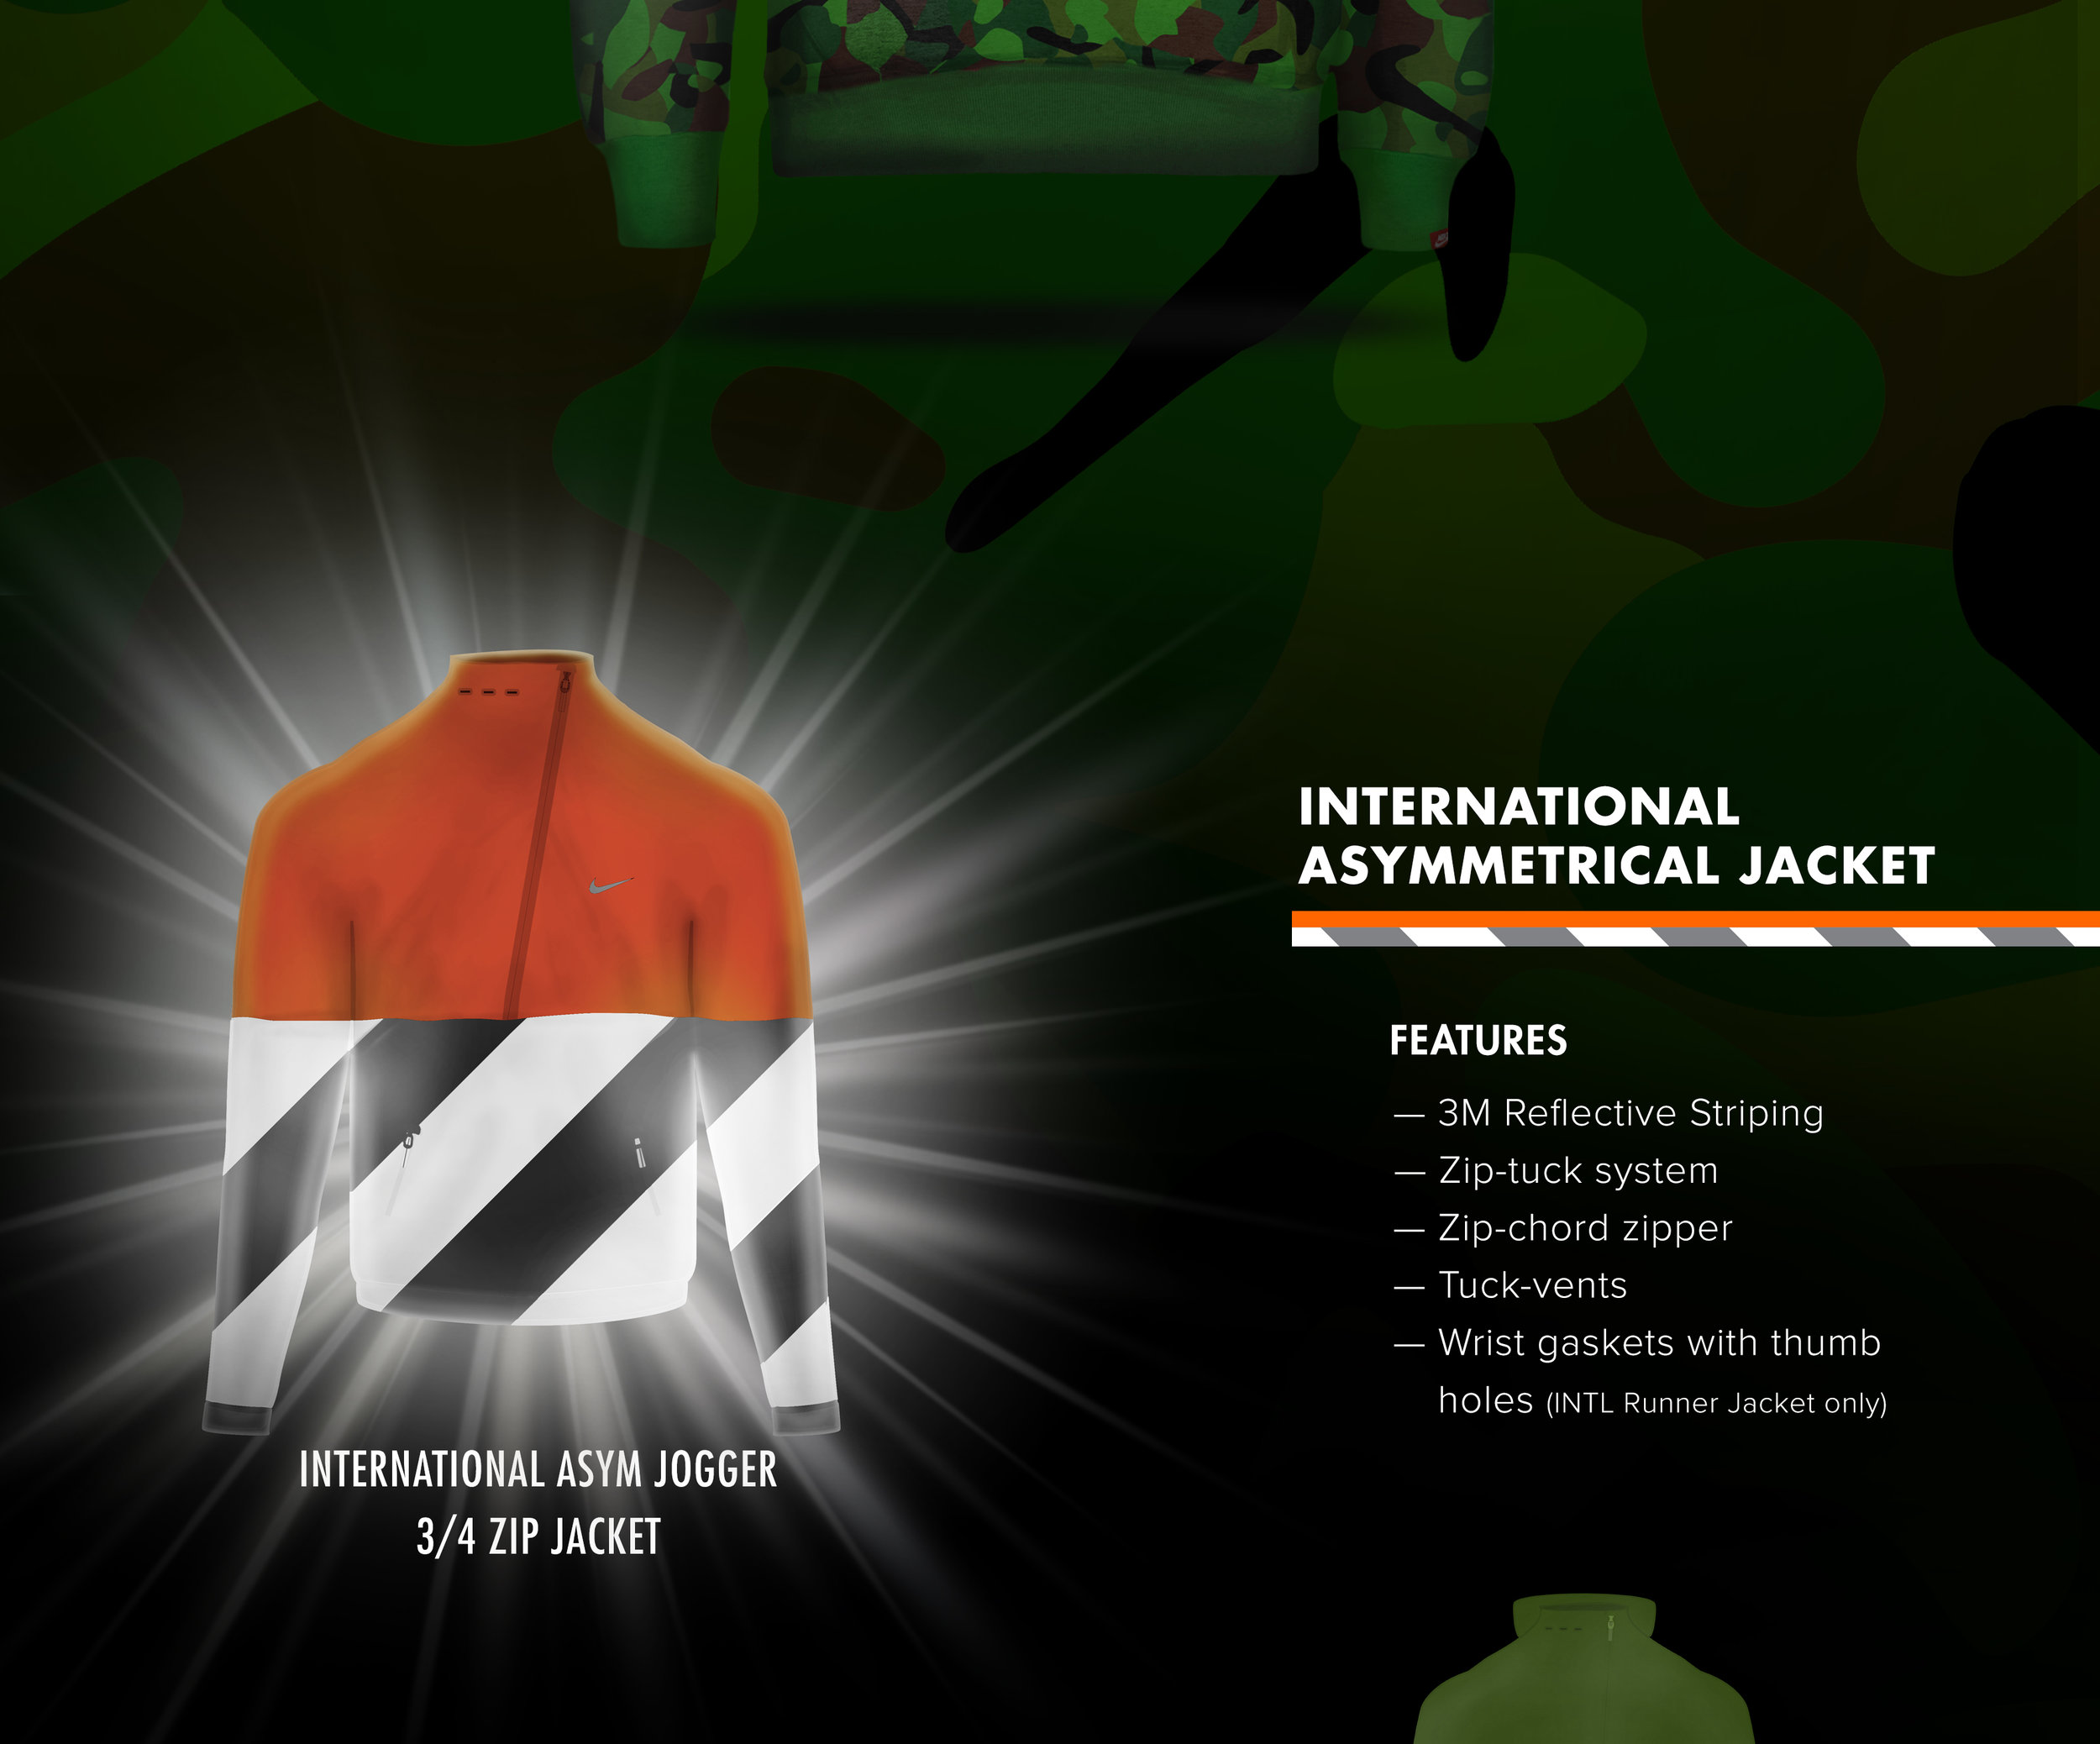 002-07-Nike_Timeline-My_Nike_Pieces-PROGRESS-TMAX-New-Non_Animated.jpg